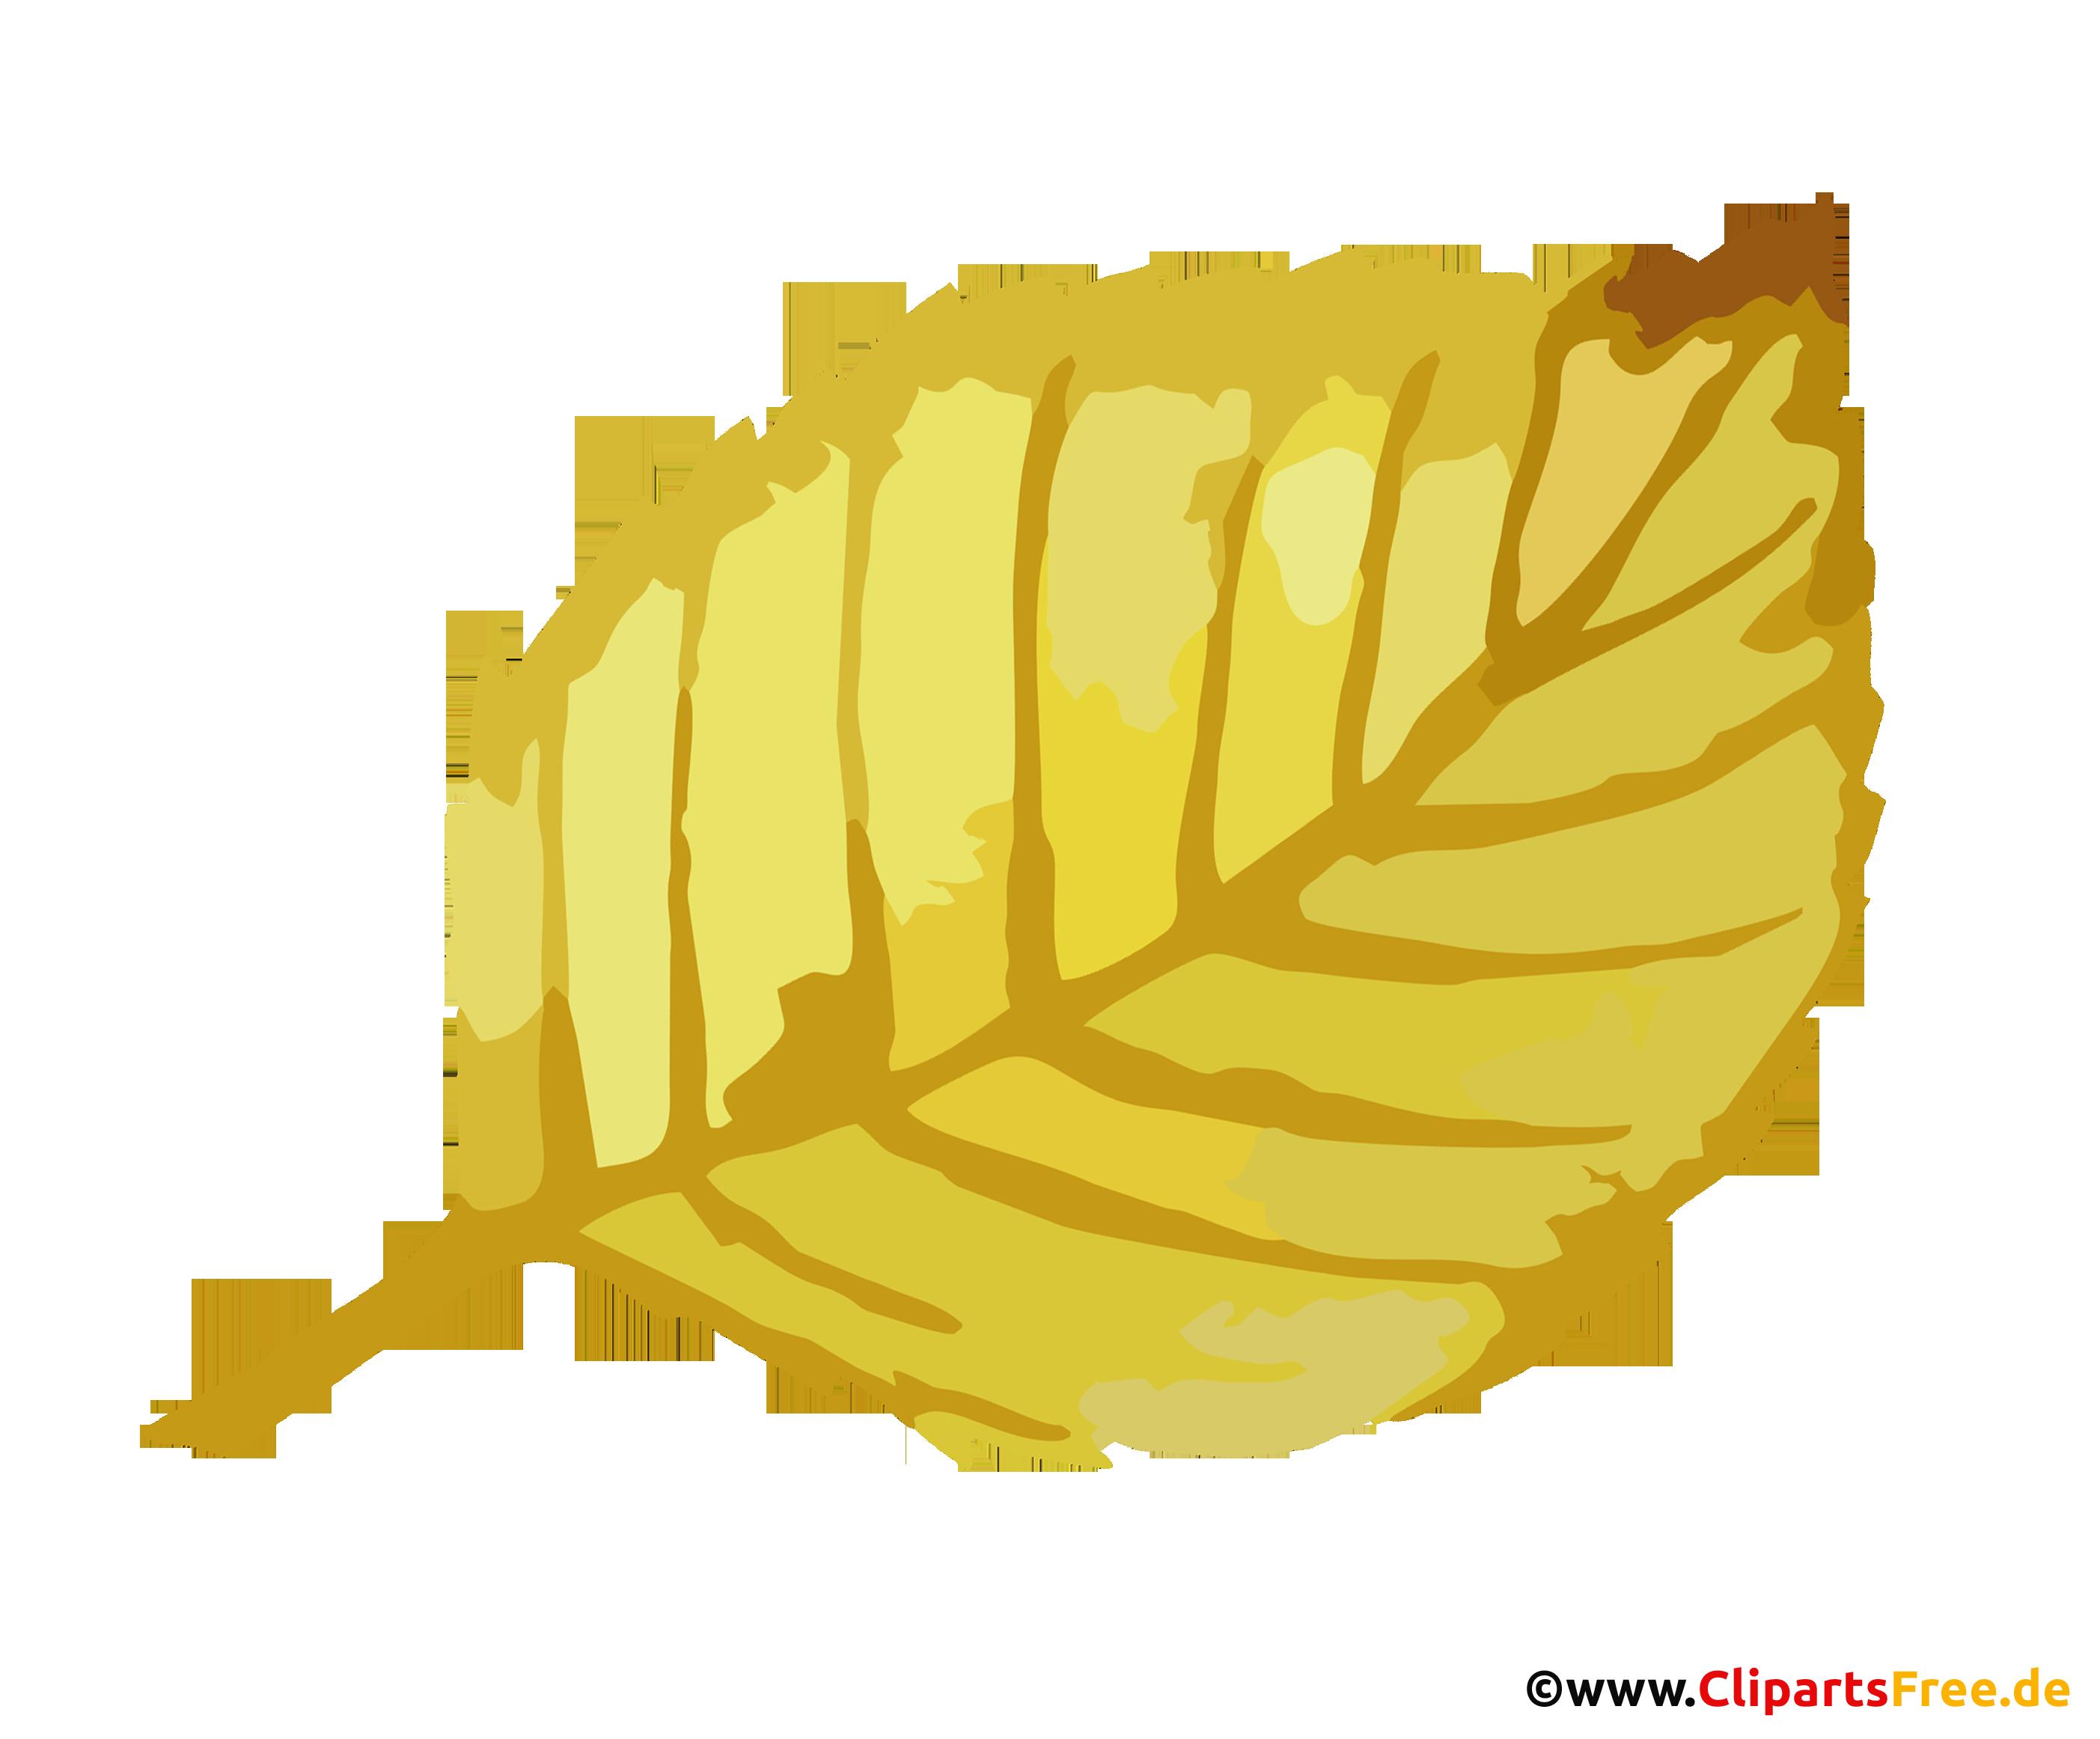 Linde Baumblatt im Herbst Clipart, Bild transparent